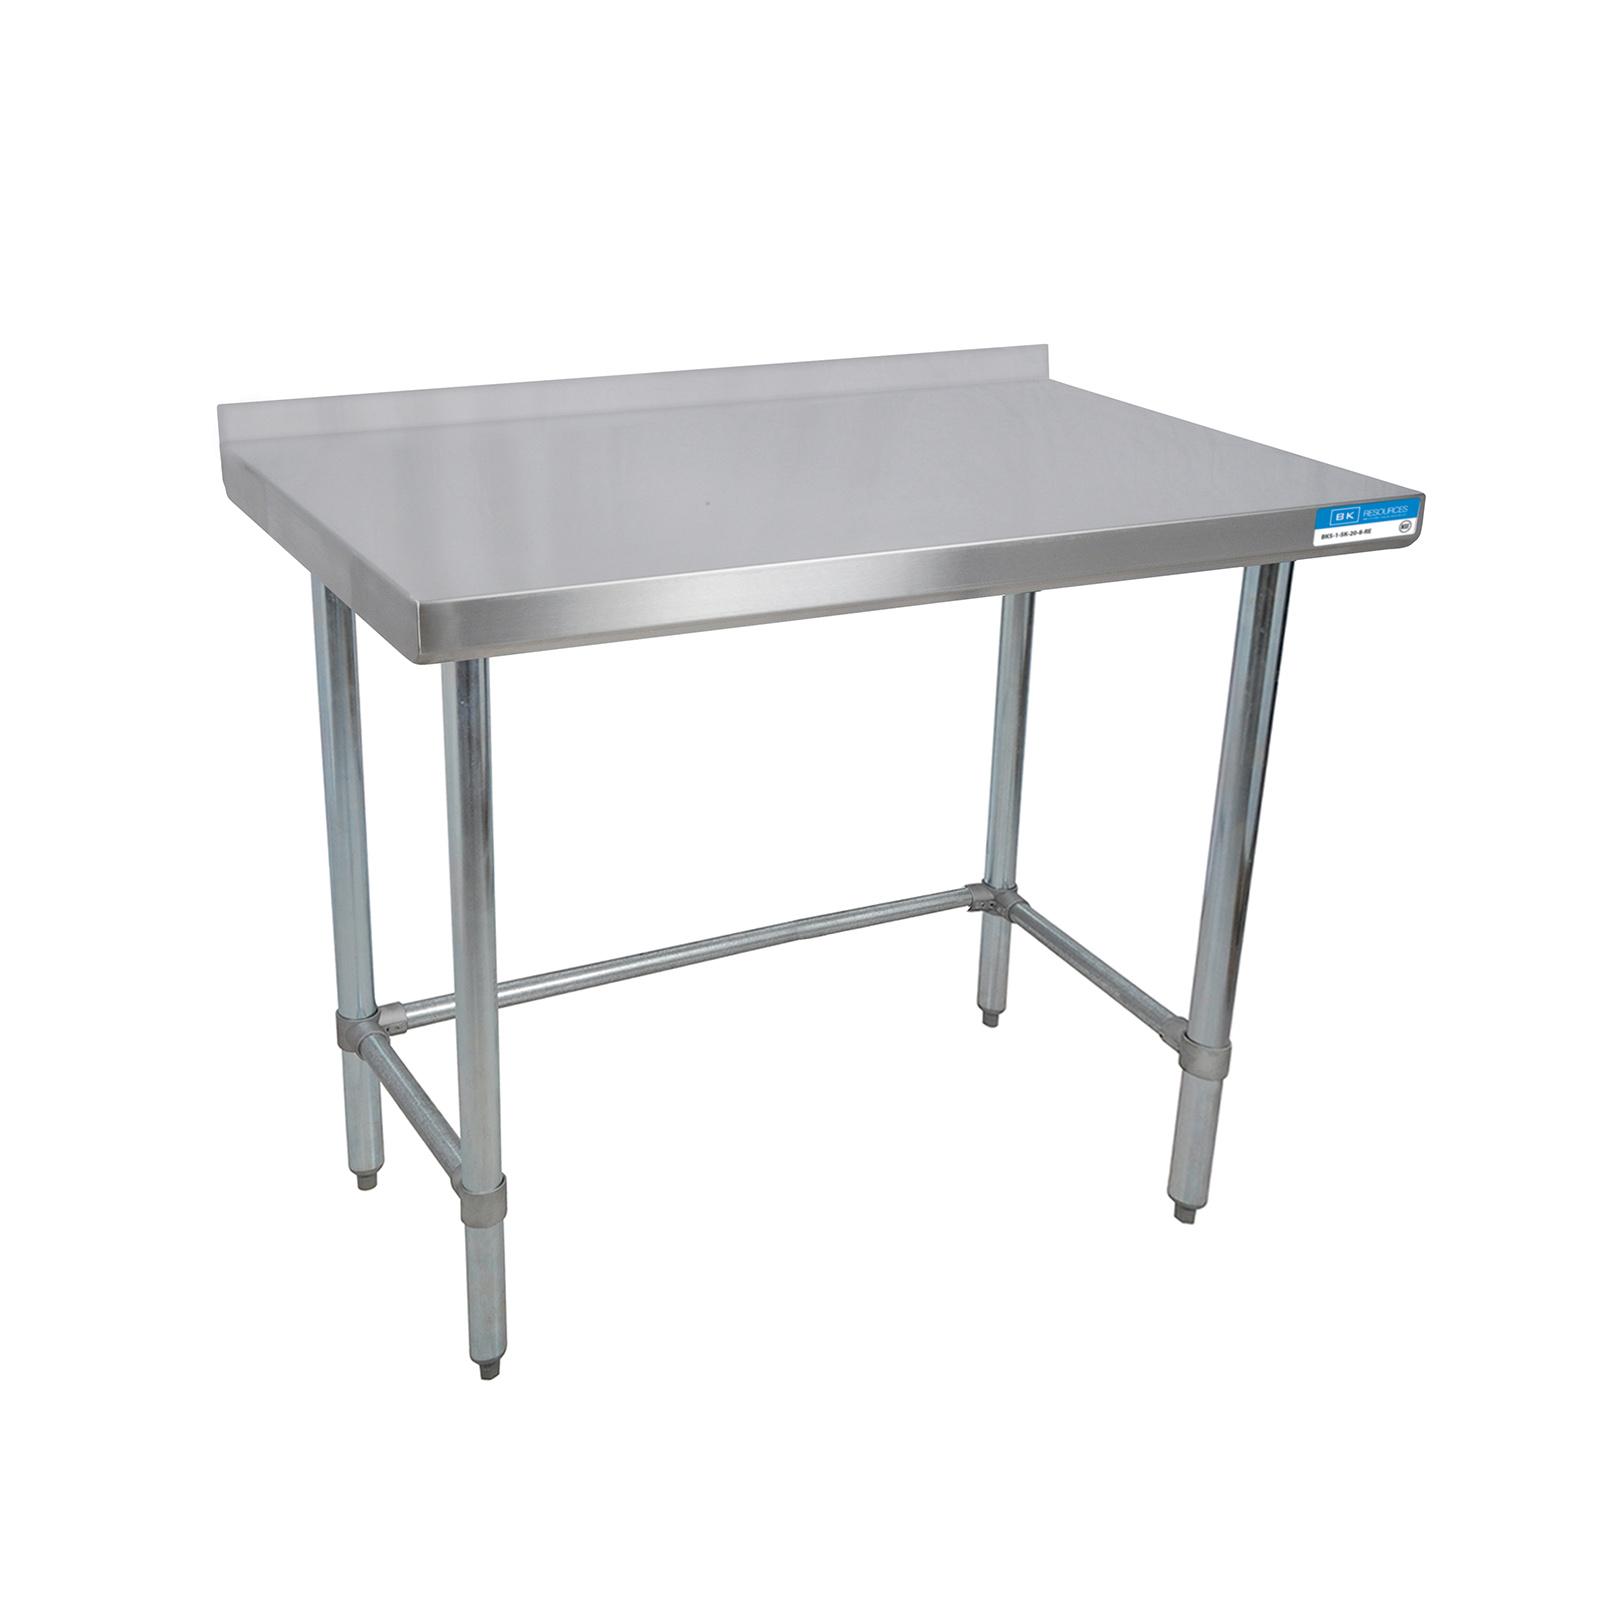 BK Resources SVTROB-3630 work table,  36